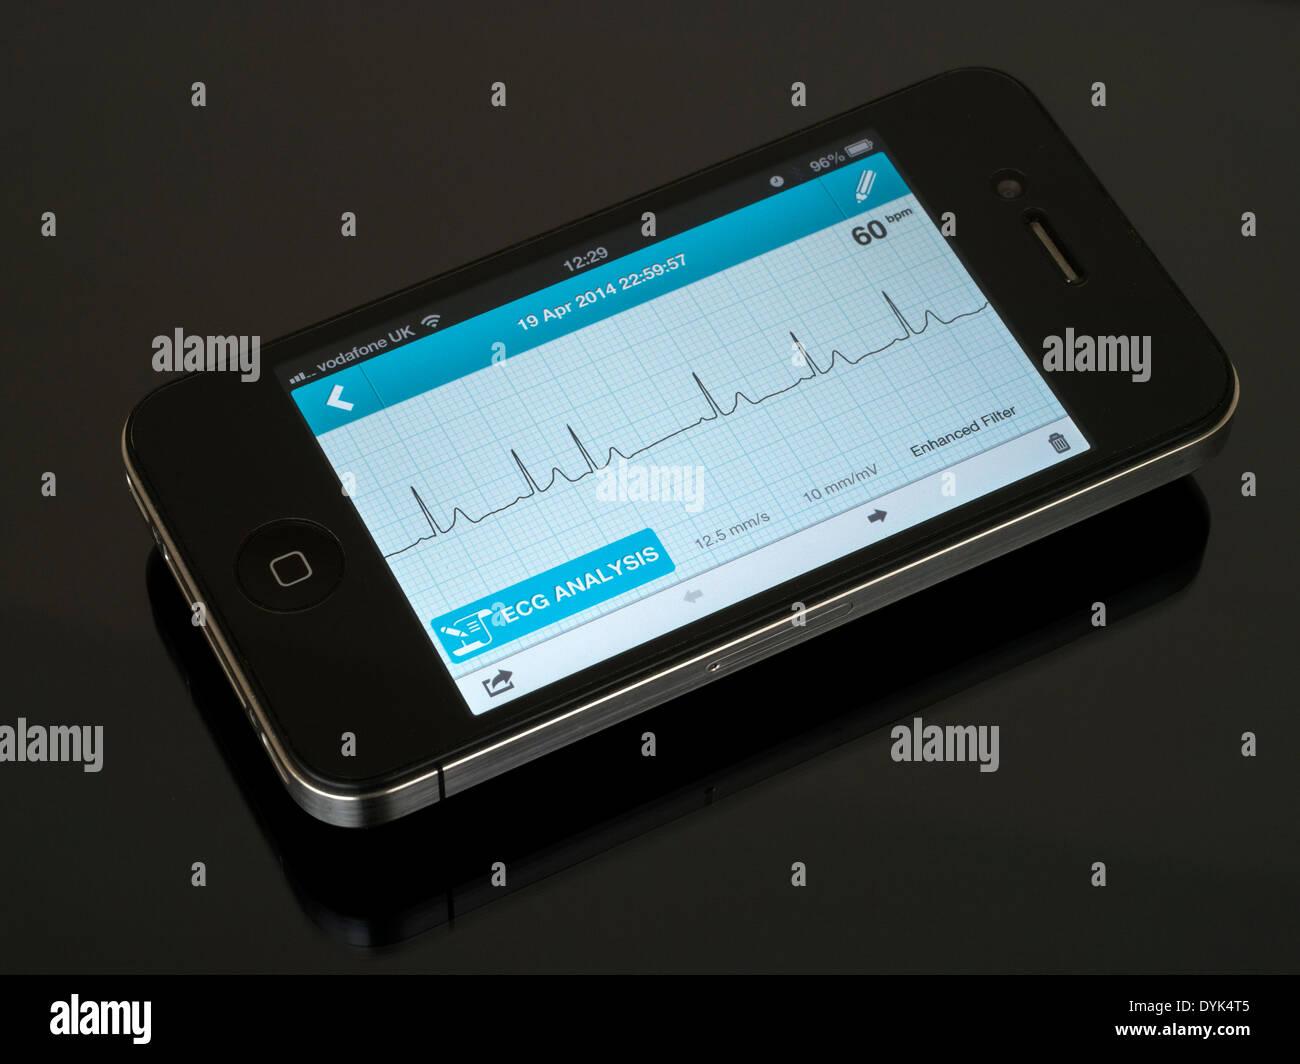 Portable ECG EKG Heart Monitor App running on iPhone 4 showing